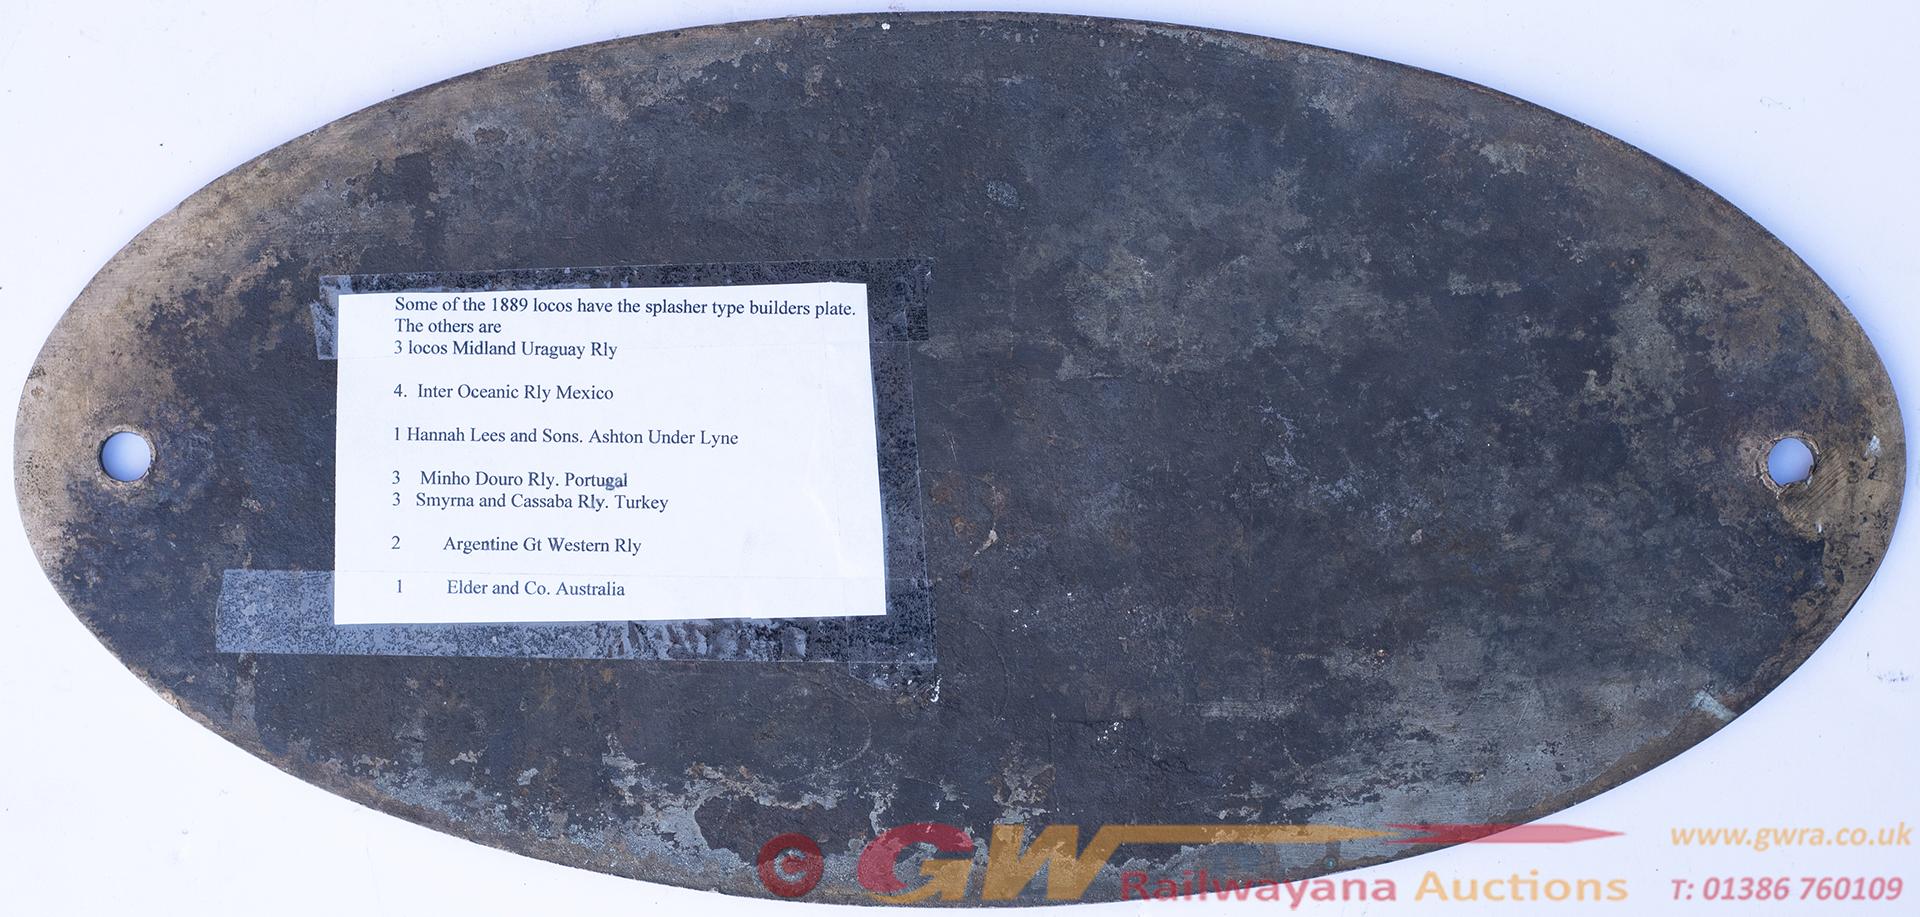 Worksplate BEYER PEACOCK & CO LTD GORTON FOUNDRY